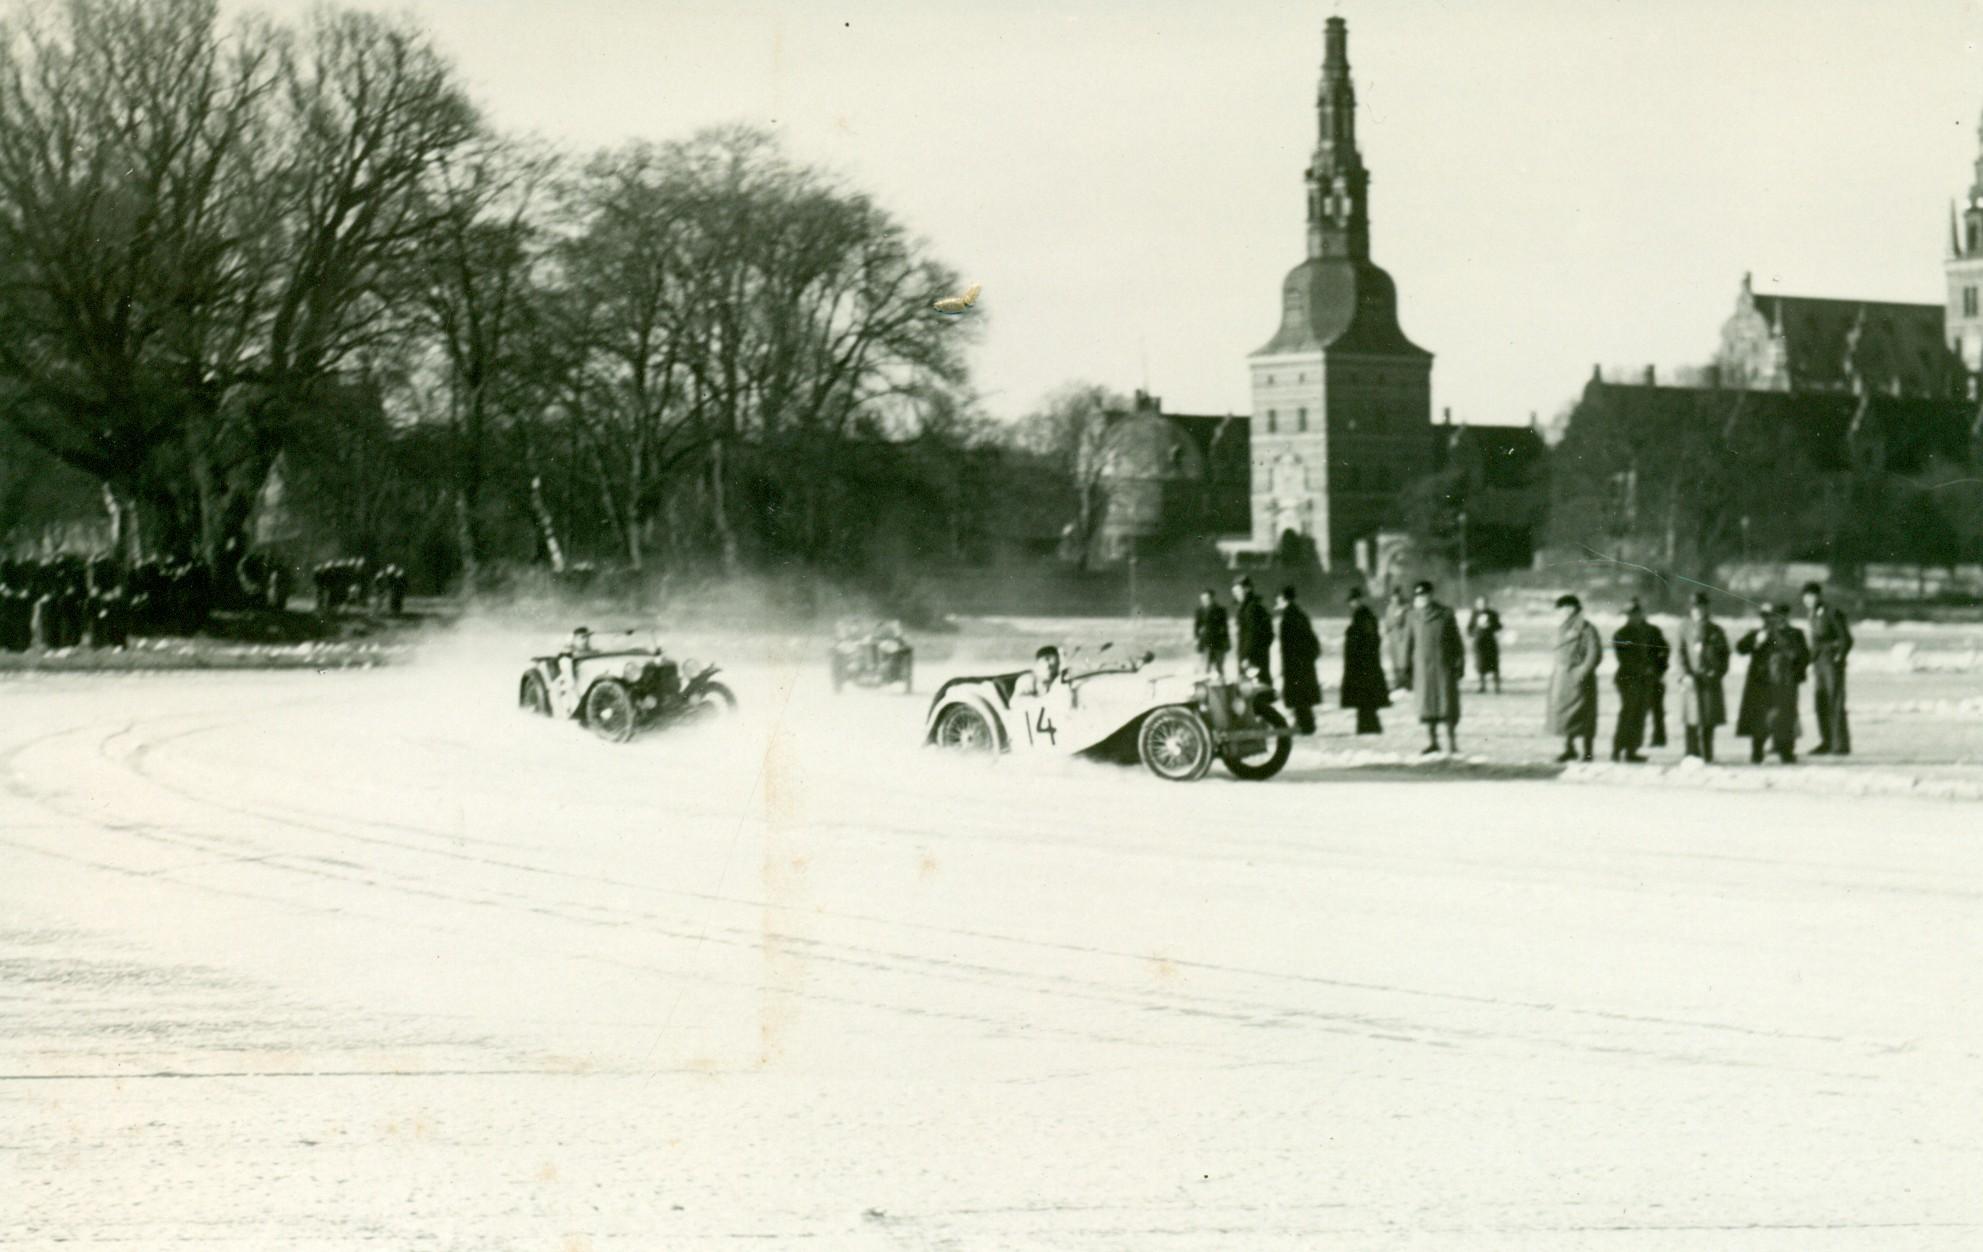 Isbaneløb, Frederiksborg Slotssø, ca. 1930-1940